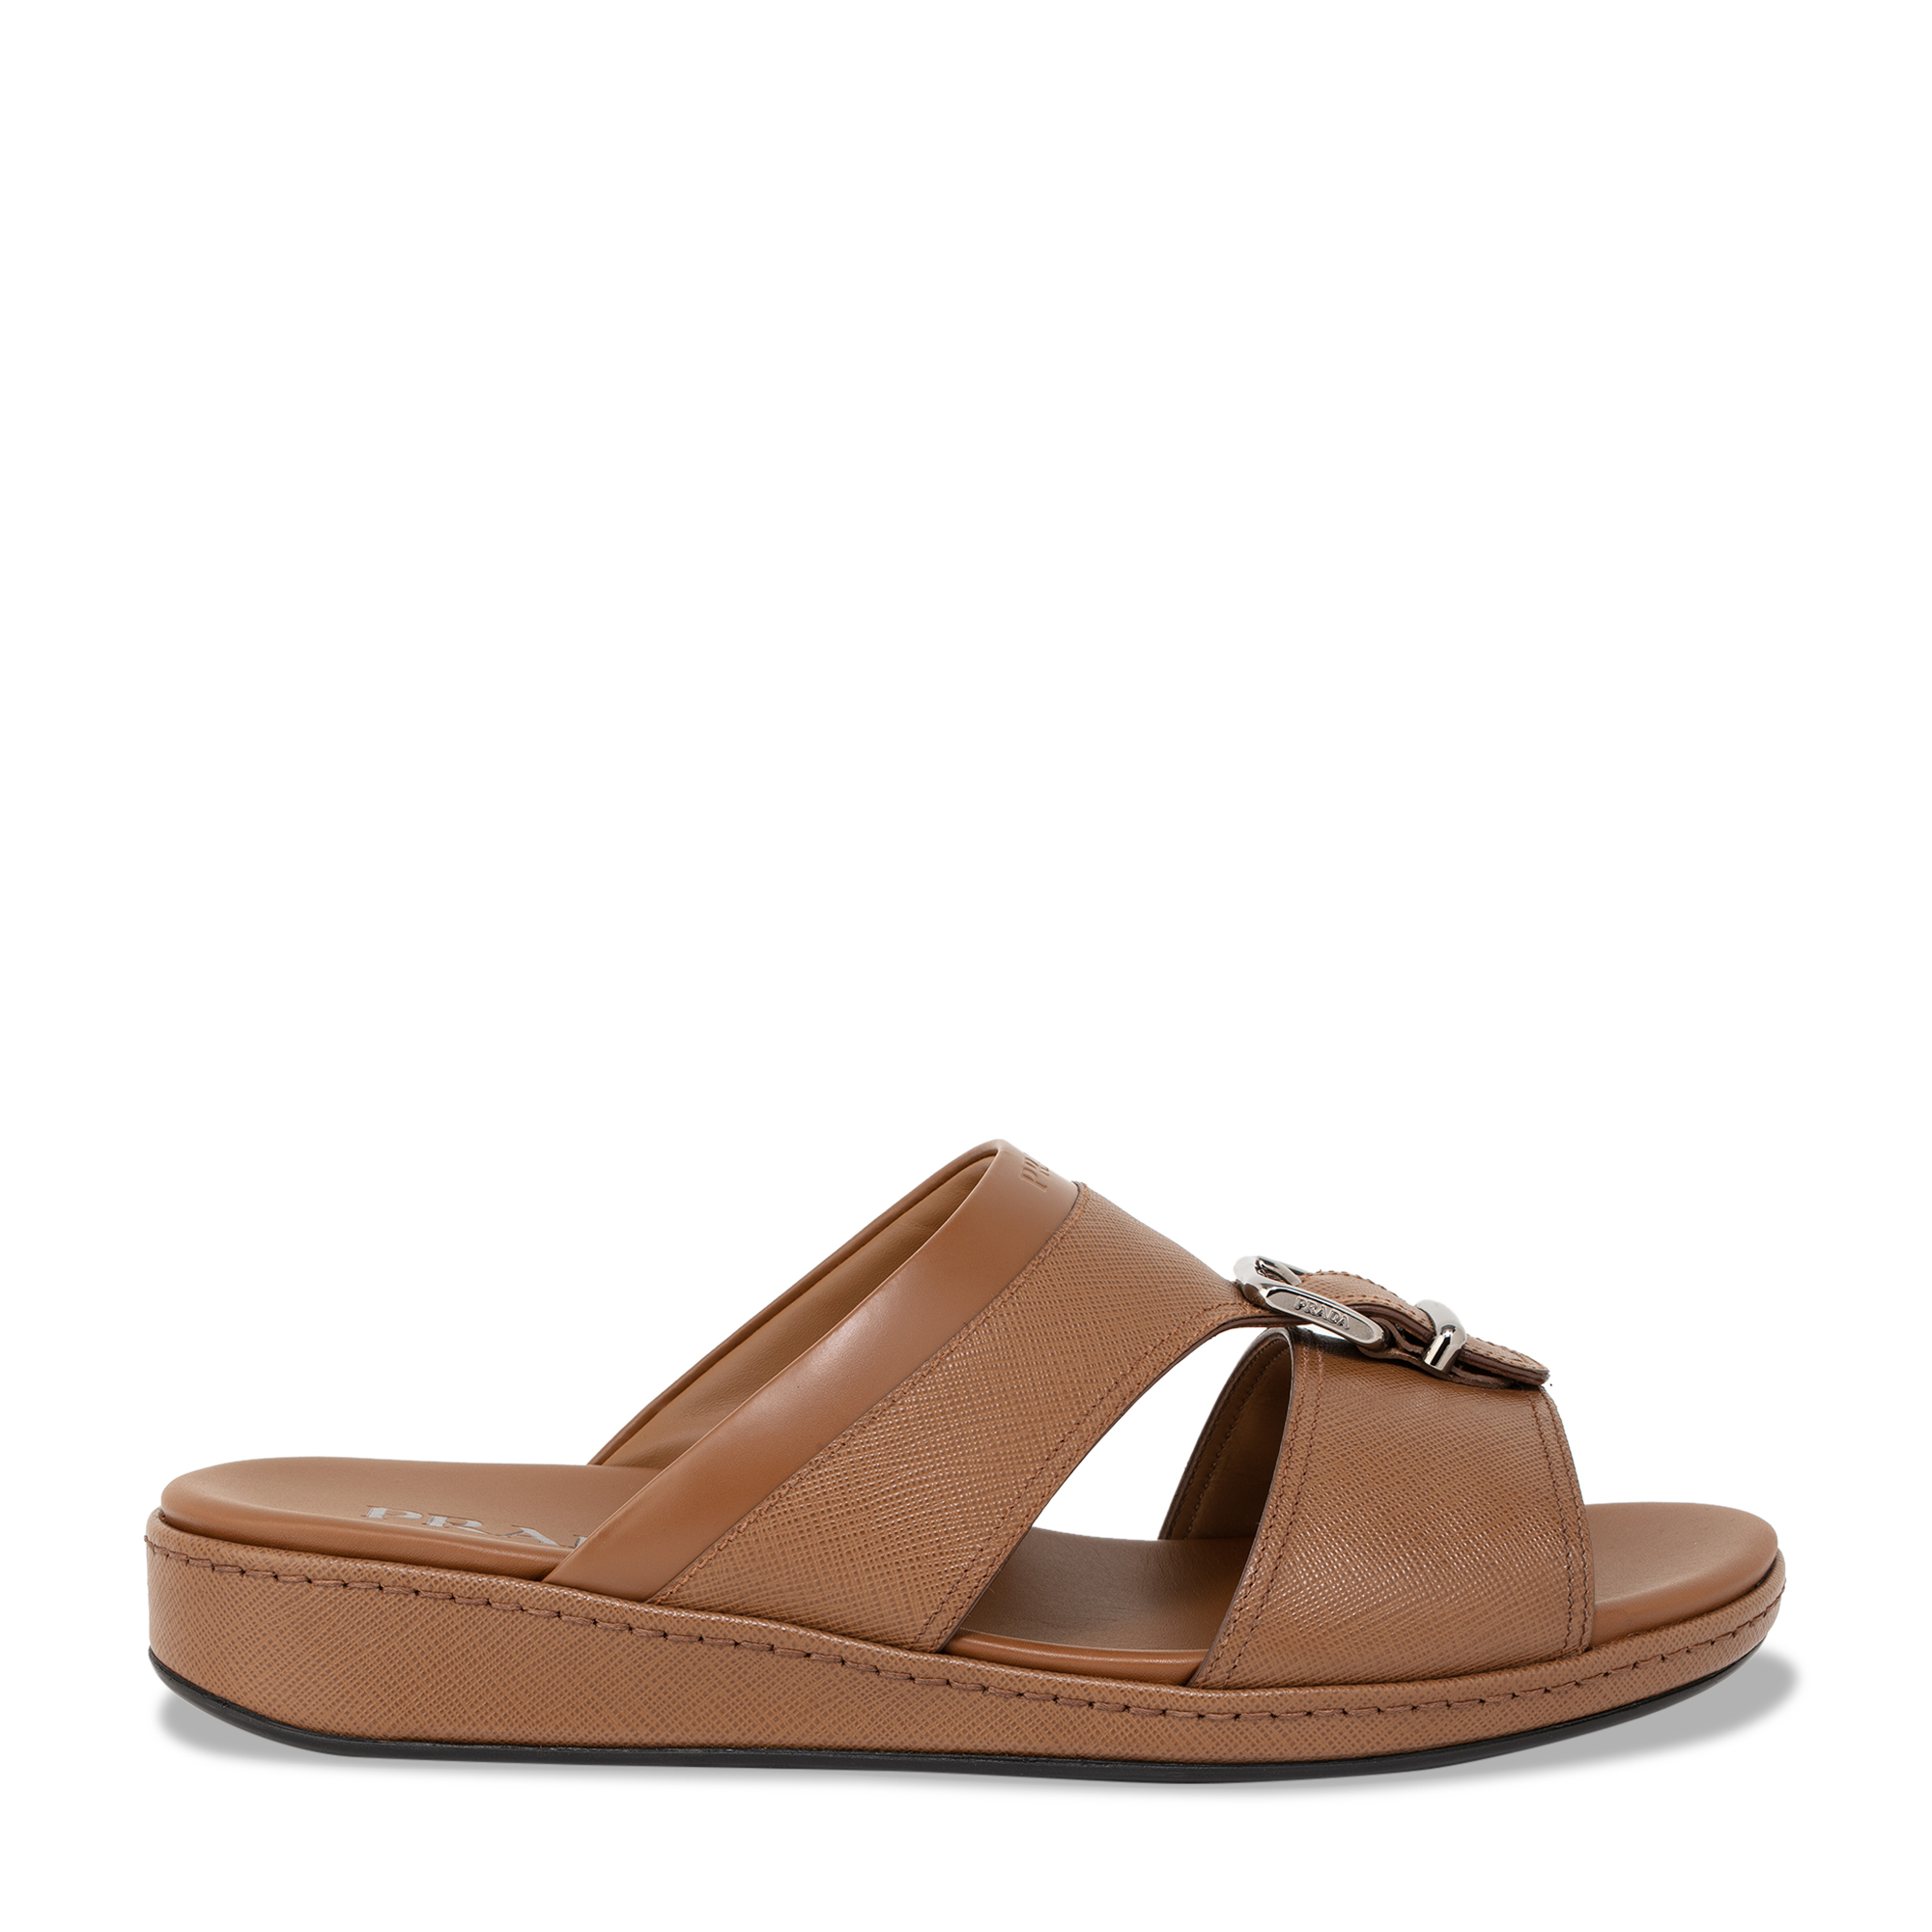 Saffiano leather sandals